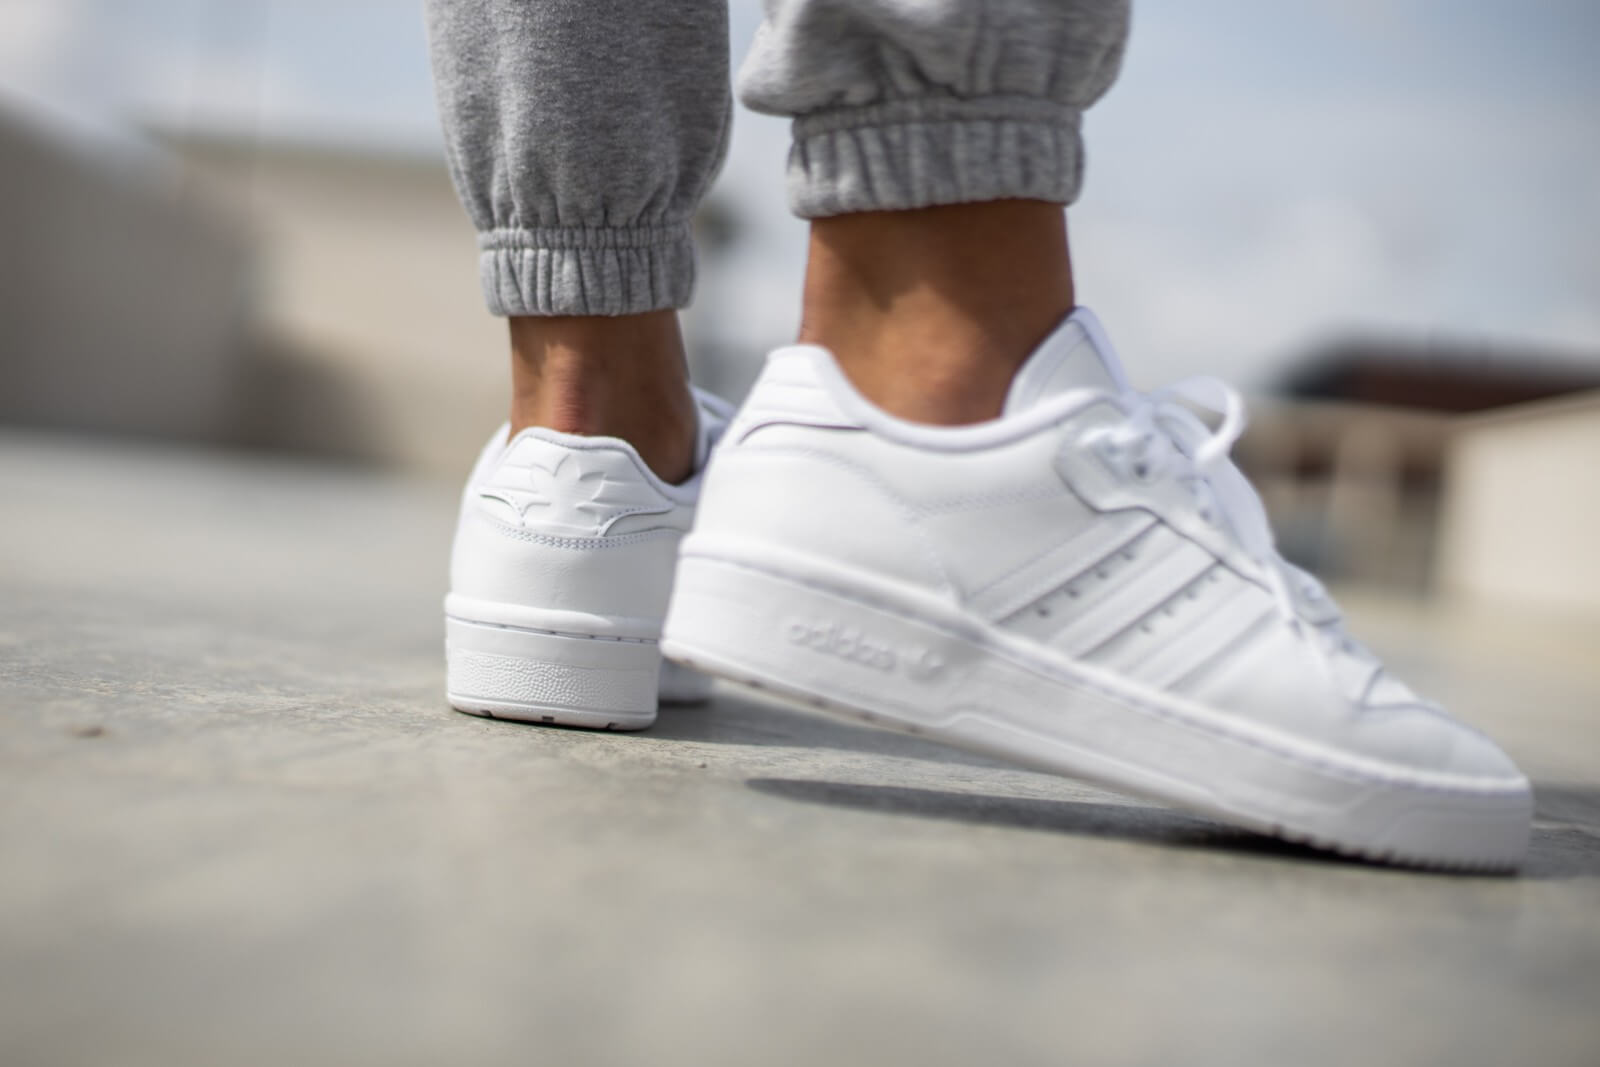 Adidas Women's Rivalry Low Cloud White